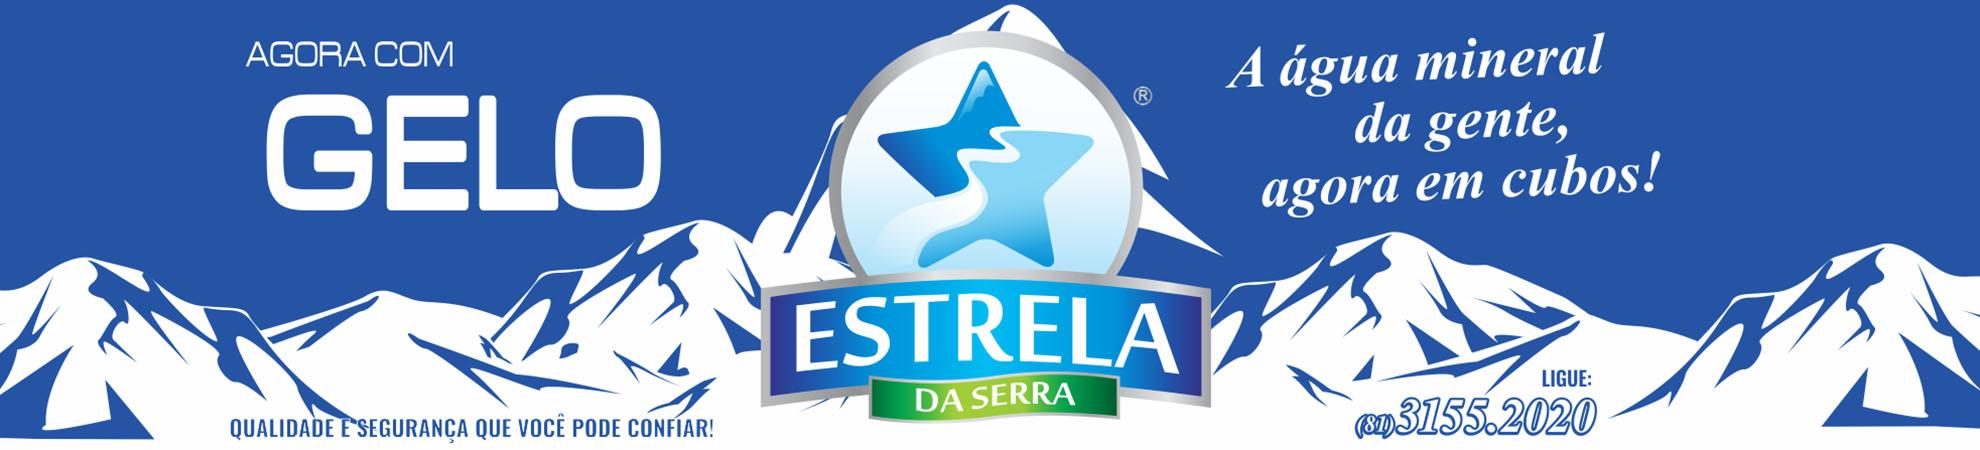 Estrela da Serra